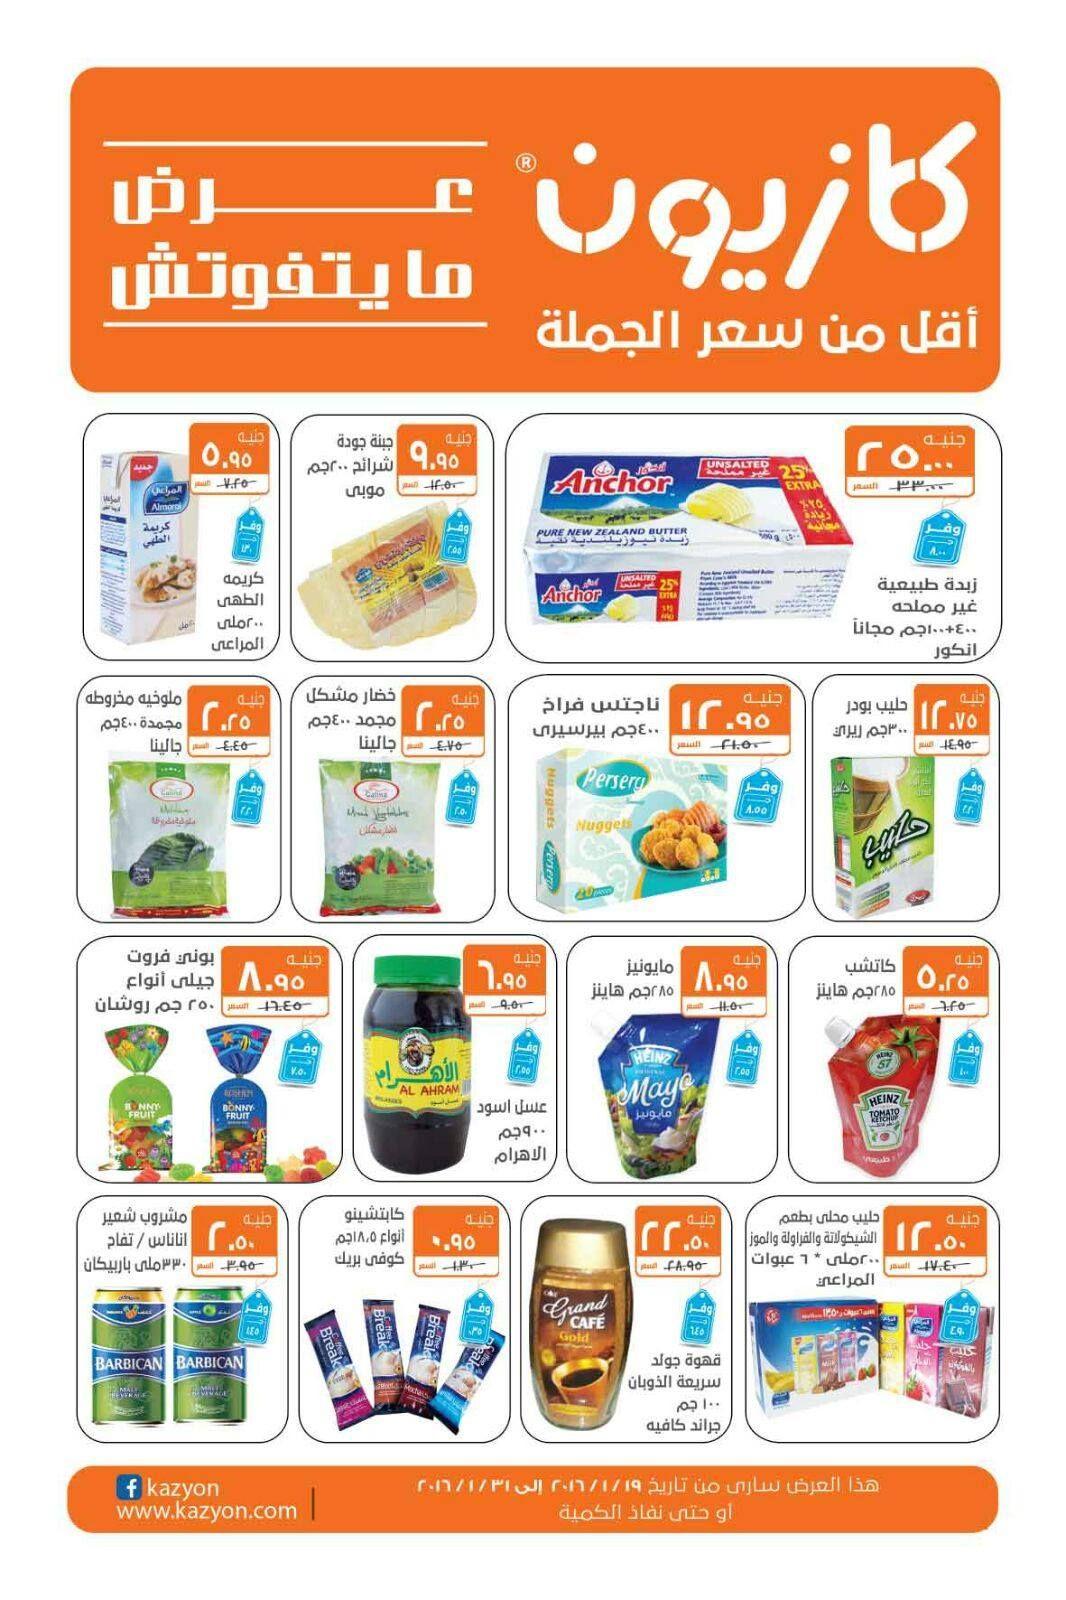 9e14aa315 عروض كازيون ماركت مصر 19 يناير حتى 31 يناير 2016 المواد الغذائية غيرها